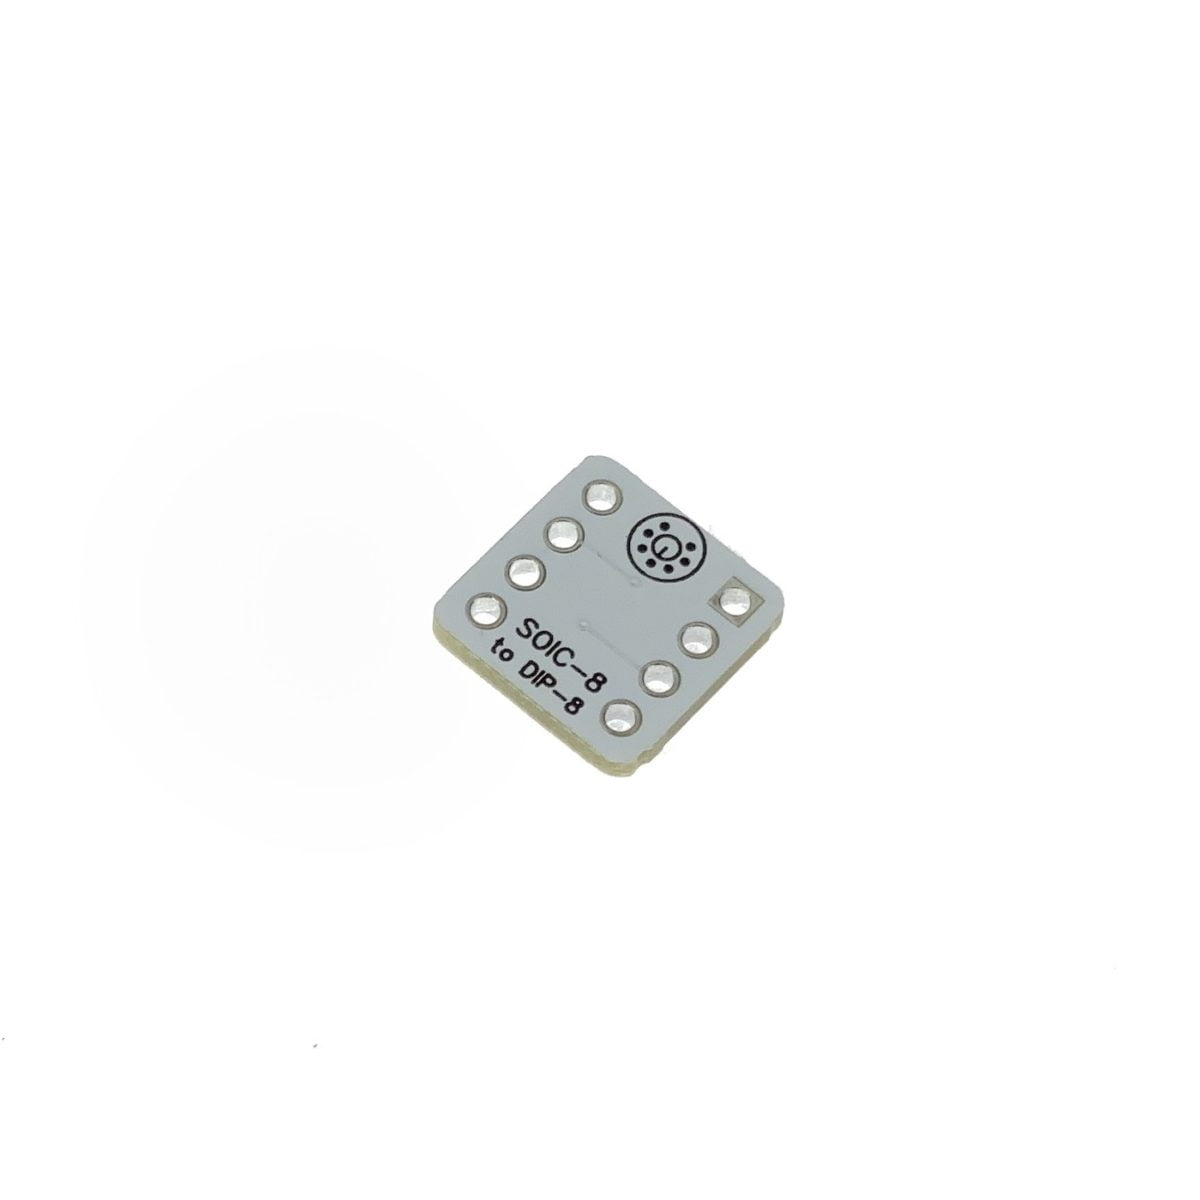 SOIC8 > DIP8 Adapter PCB [10pcs.]